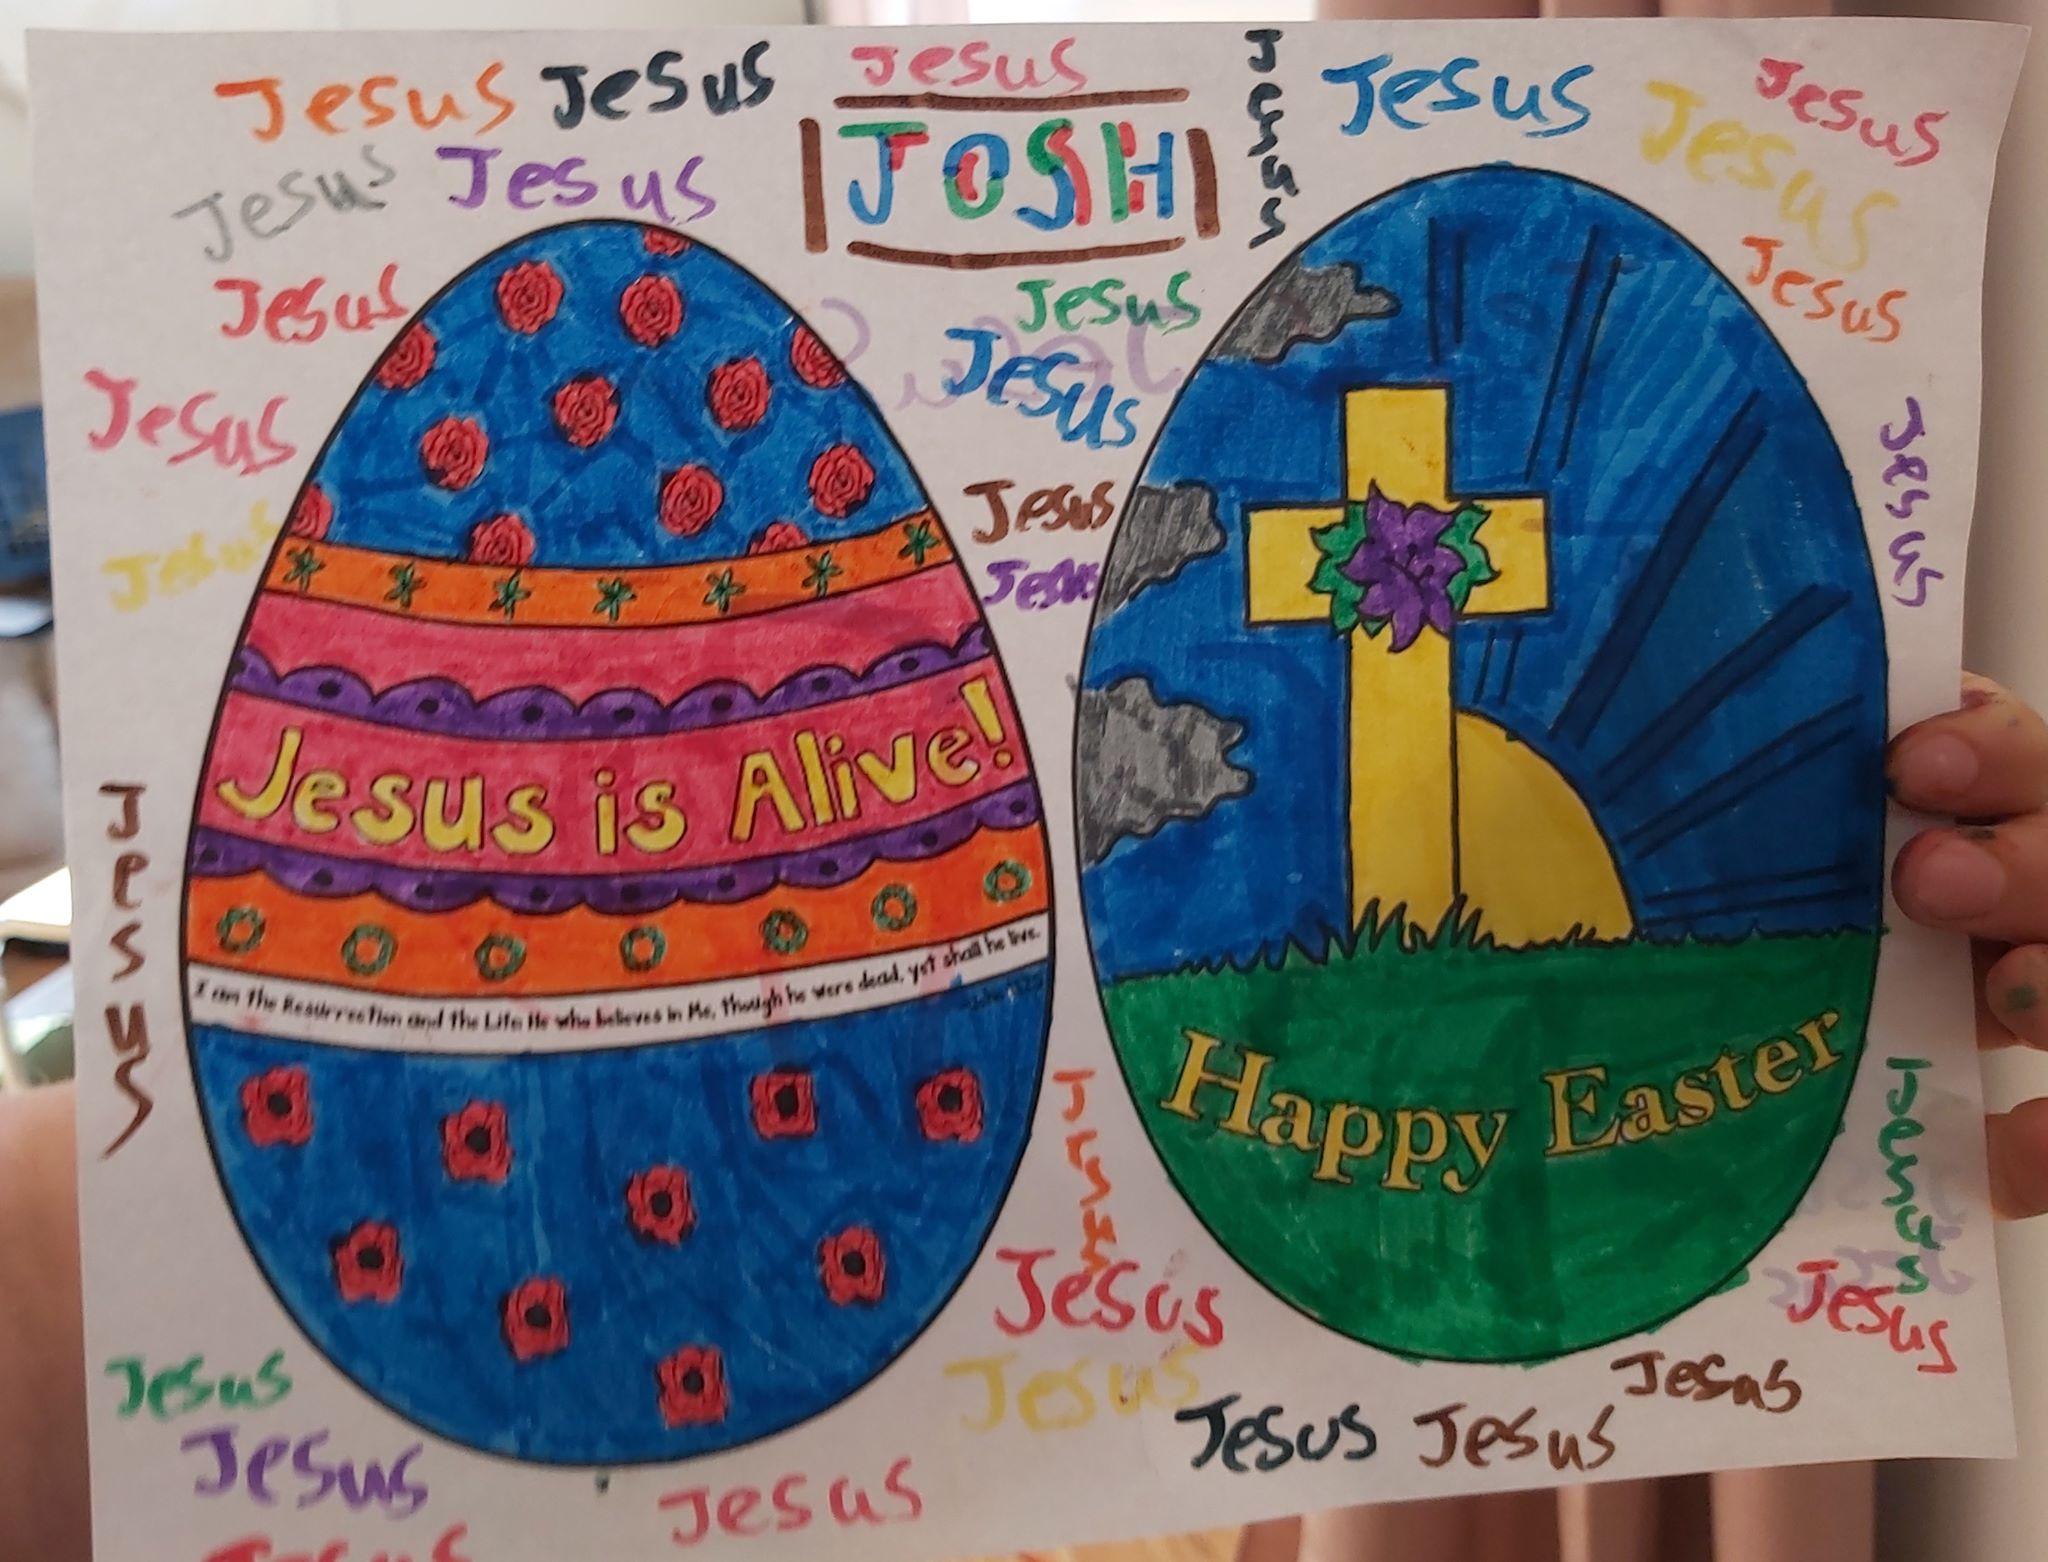 Josh's colouring page